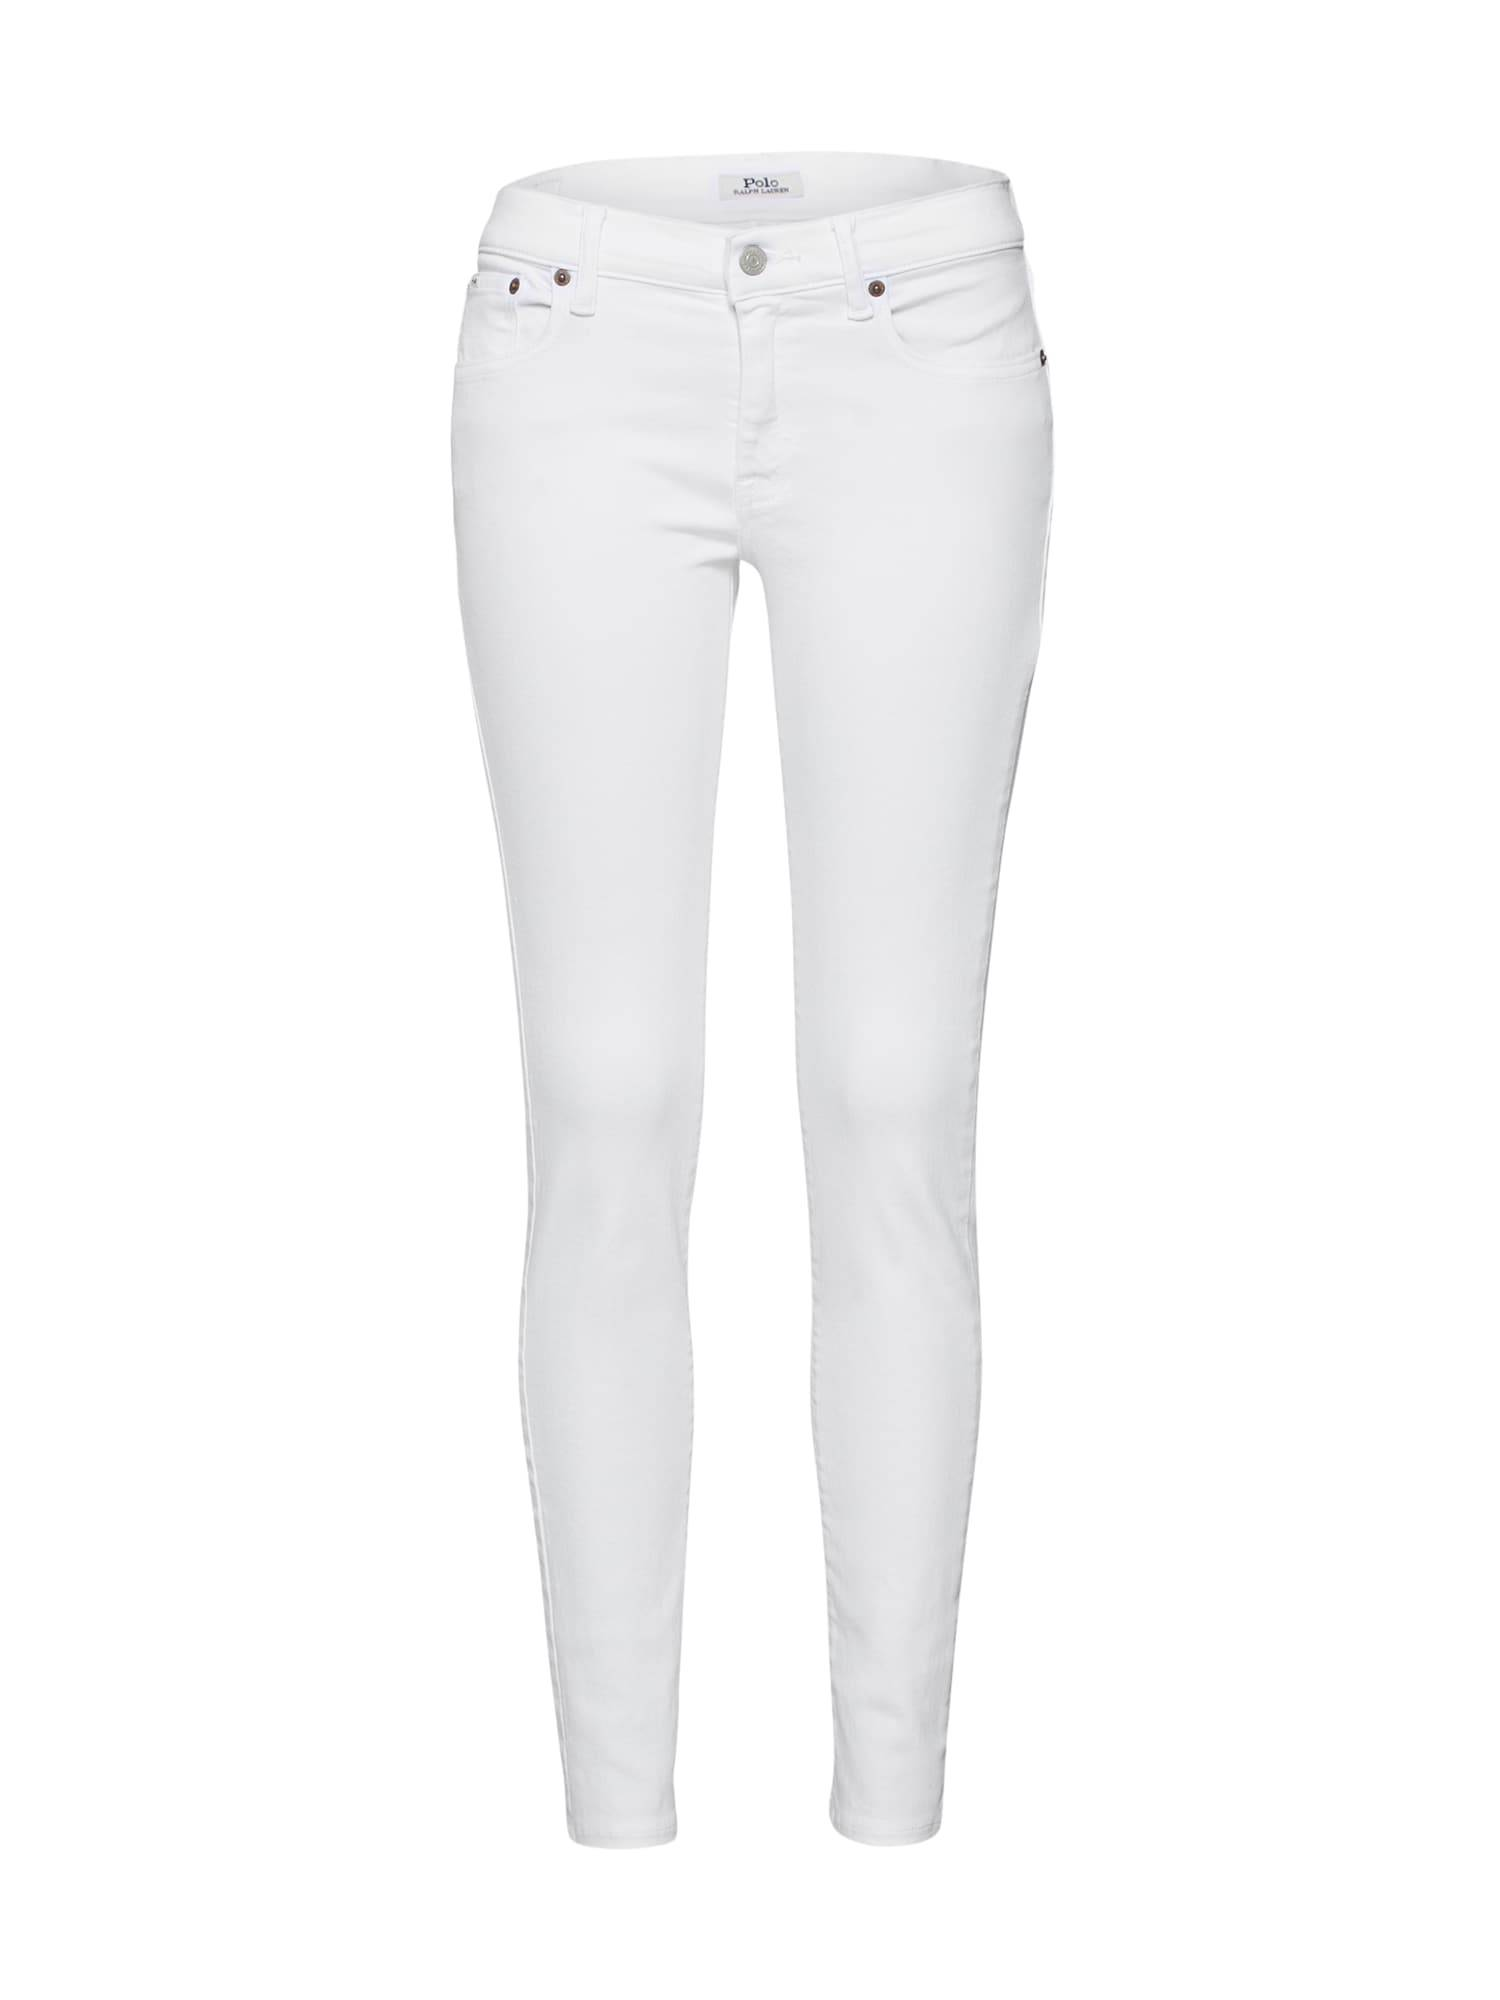 Polo Ralph Lauren Jean 'SKI'  - Blanc - Taille: 28 - female